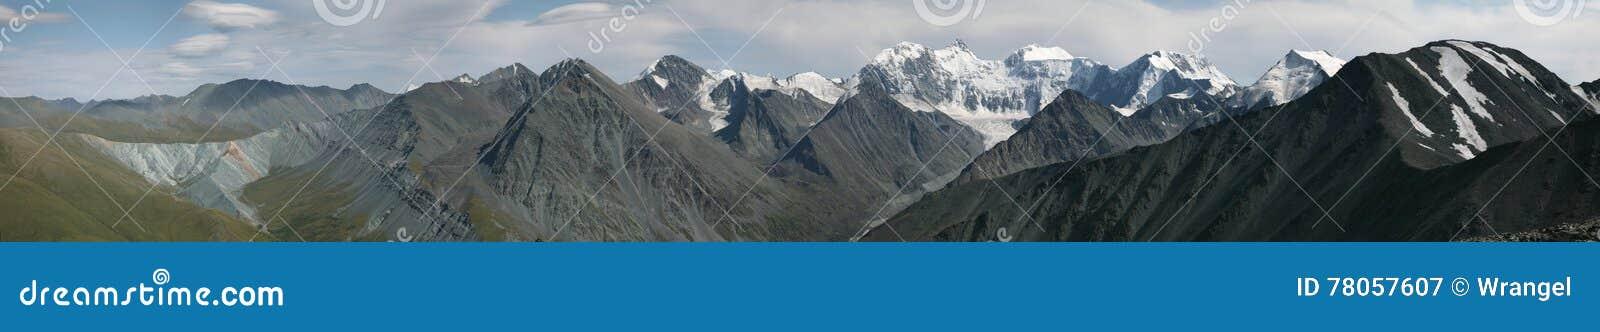 Гора в горах Altai, Россия Belukha